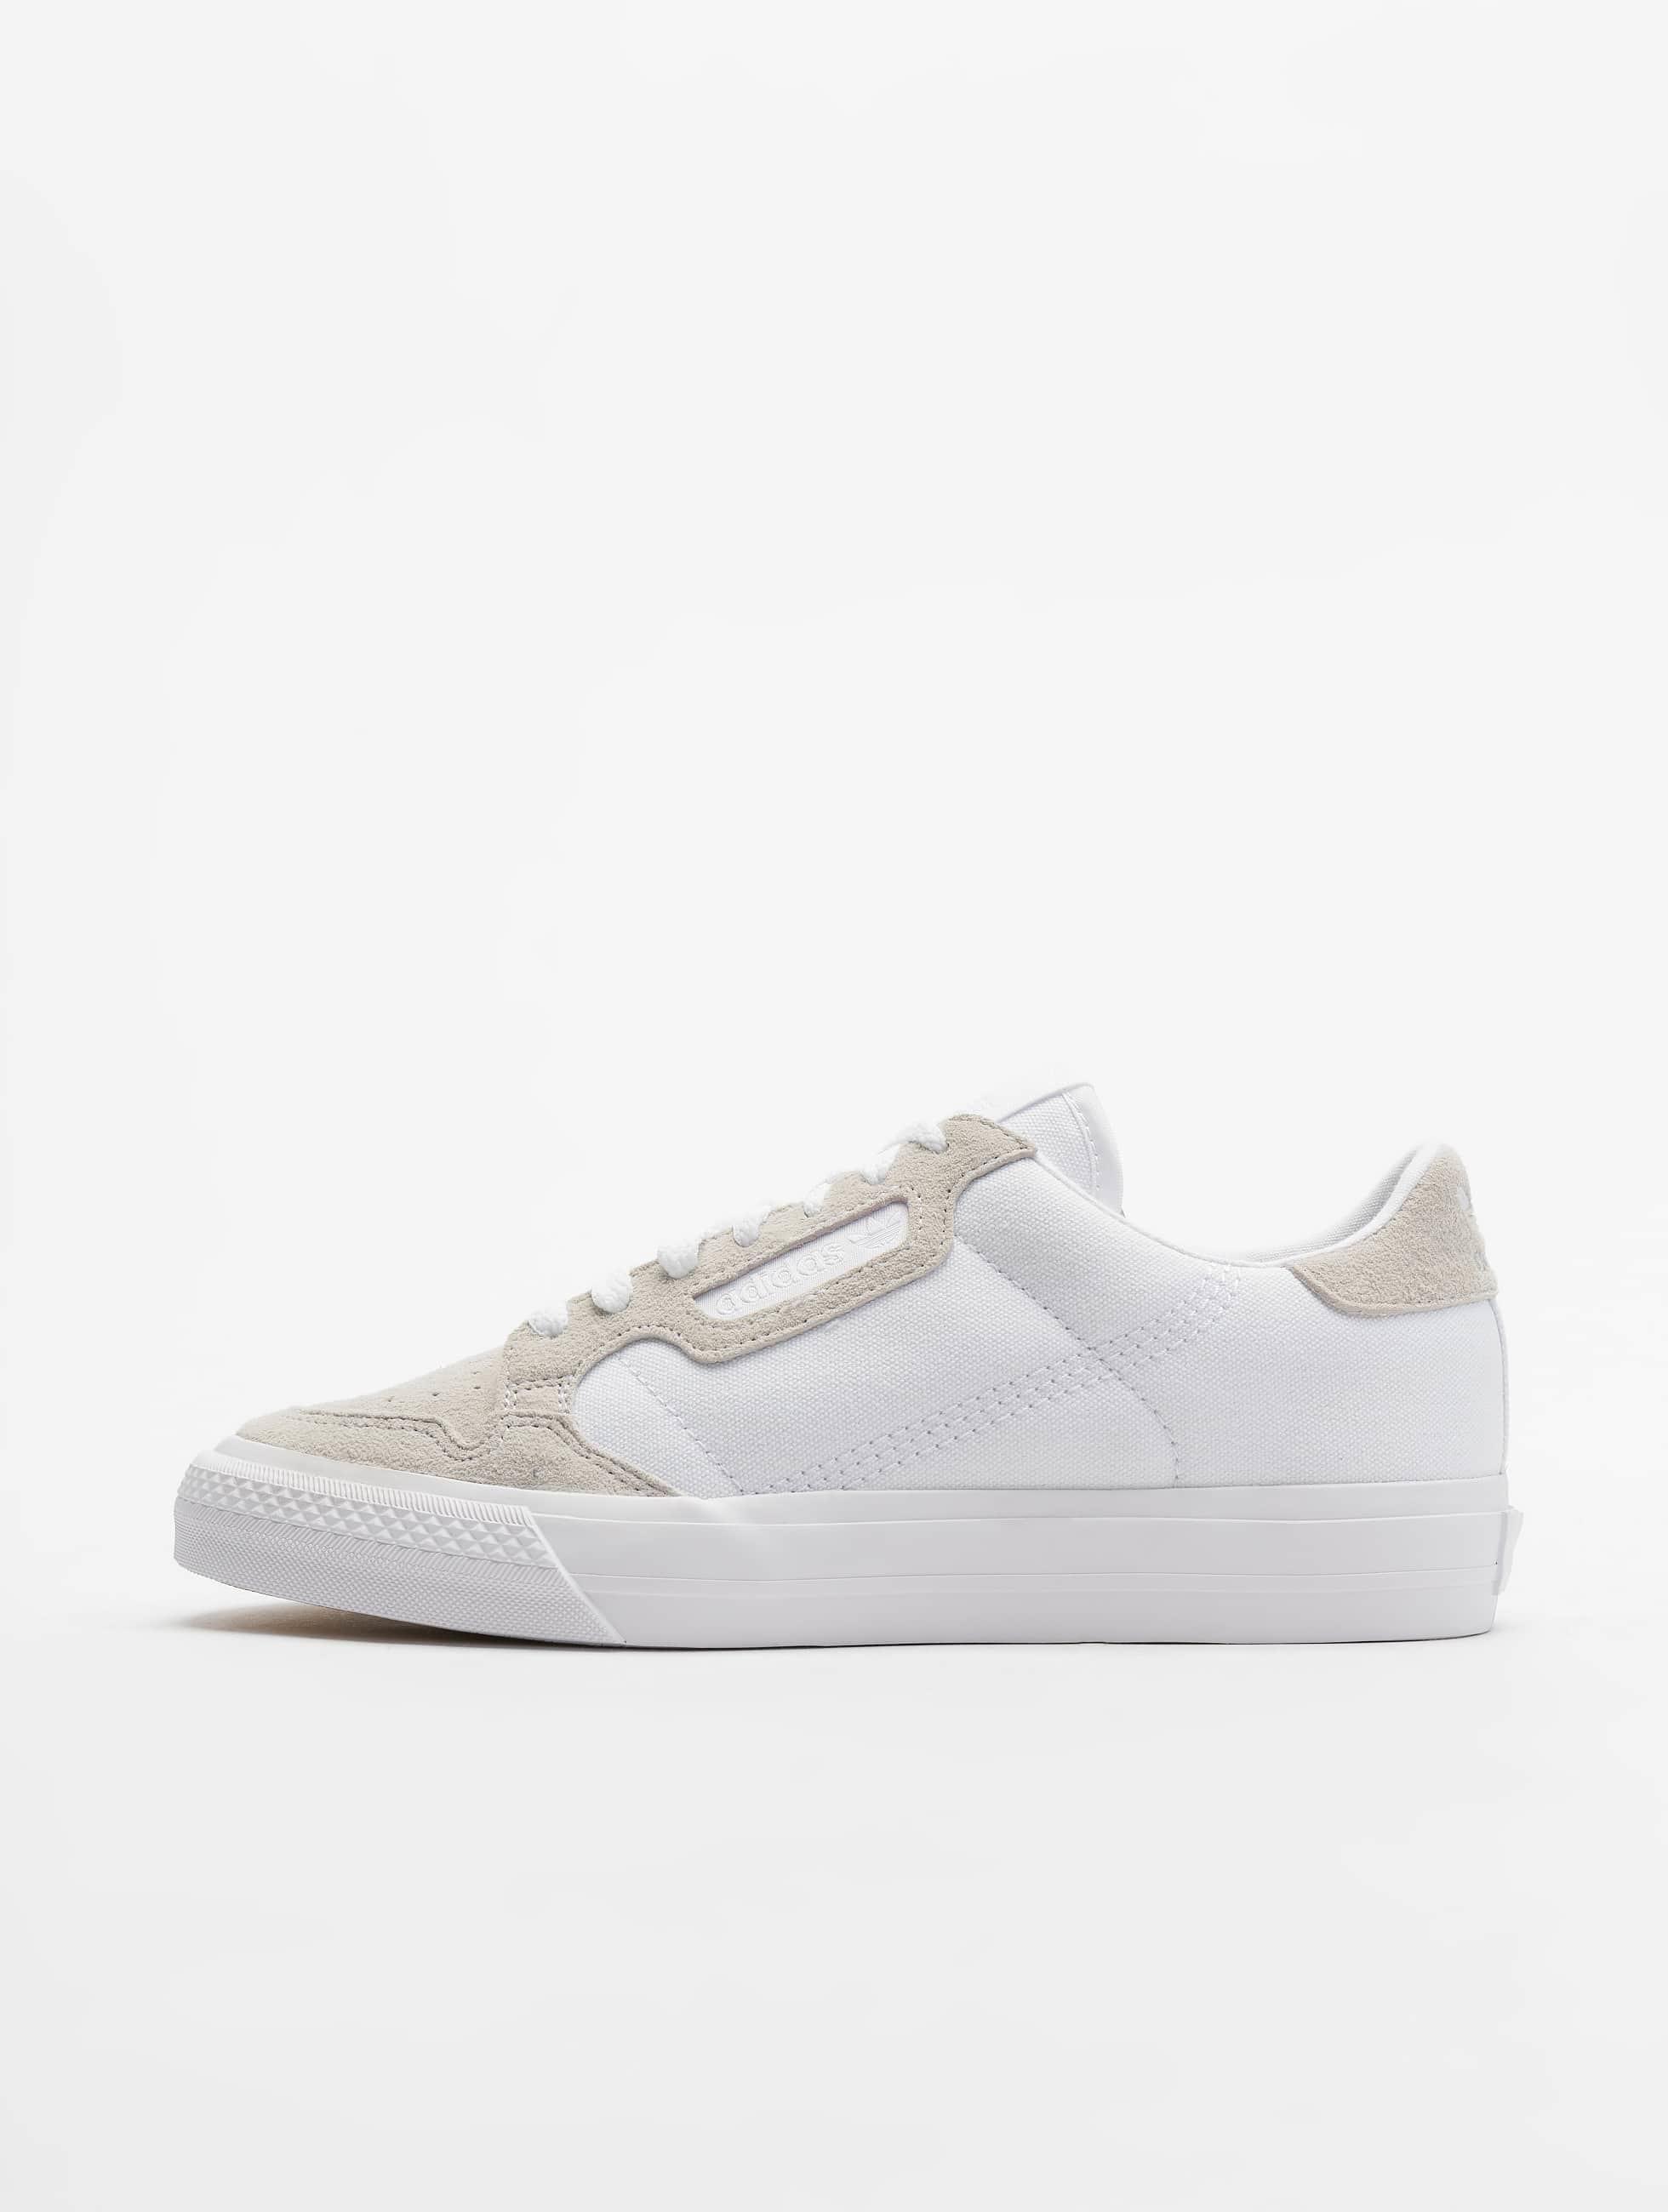 sale retailer 29018 2c8ea adidas-originals-tennarit-valkoinen-684640.jpg